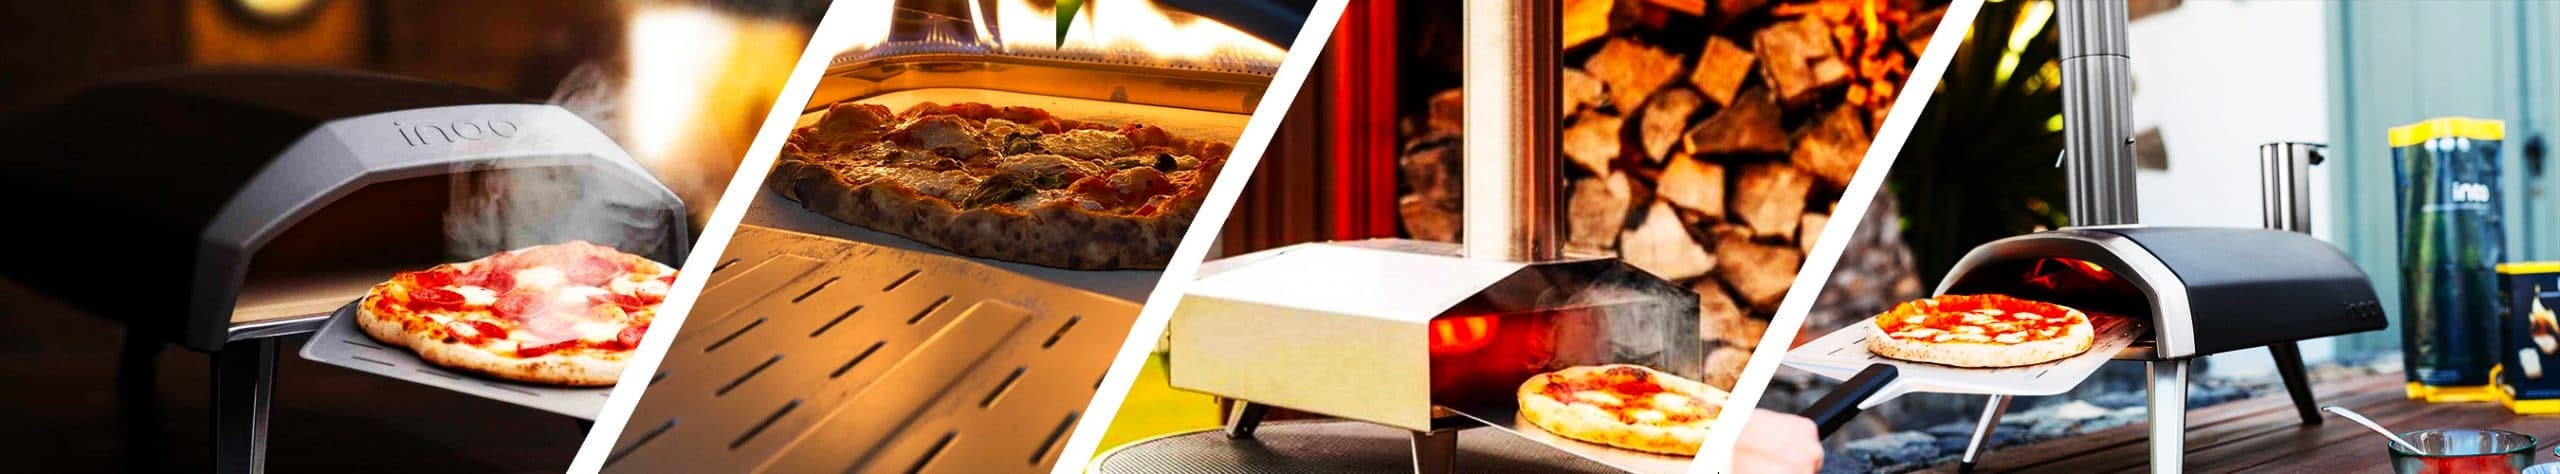 Ooni Forno Pizza